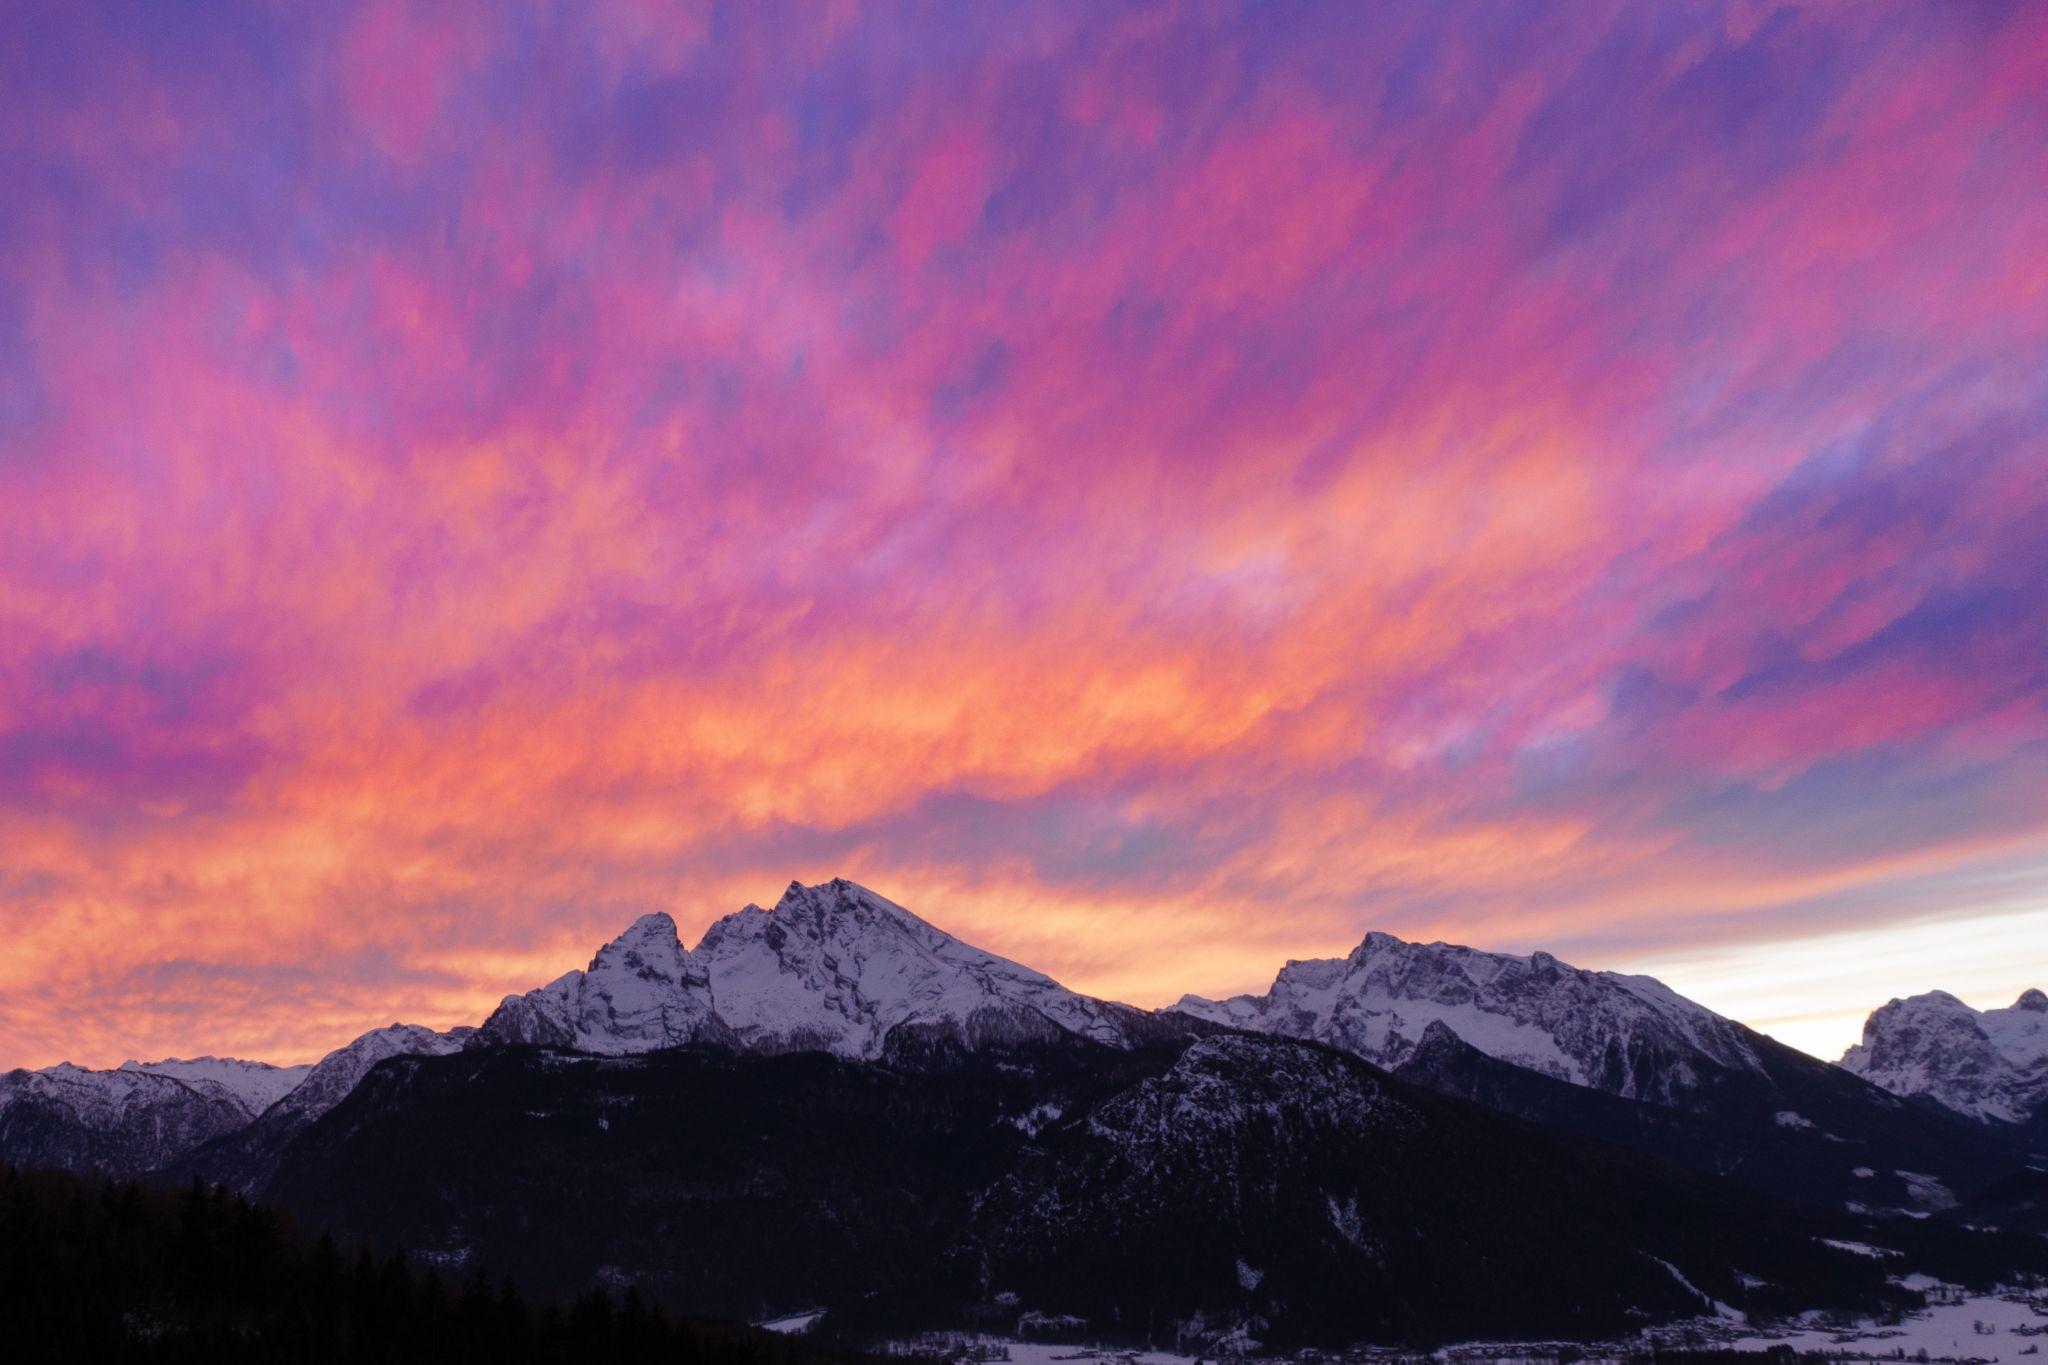 Berchtesgaden / Windbeutelbaron, Germany